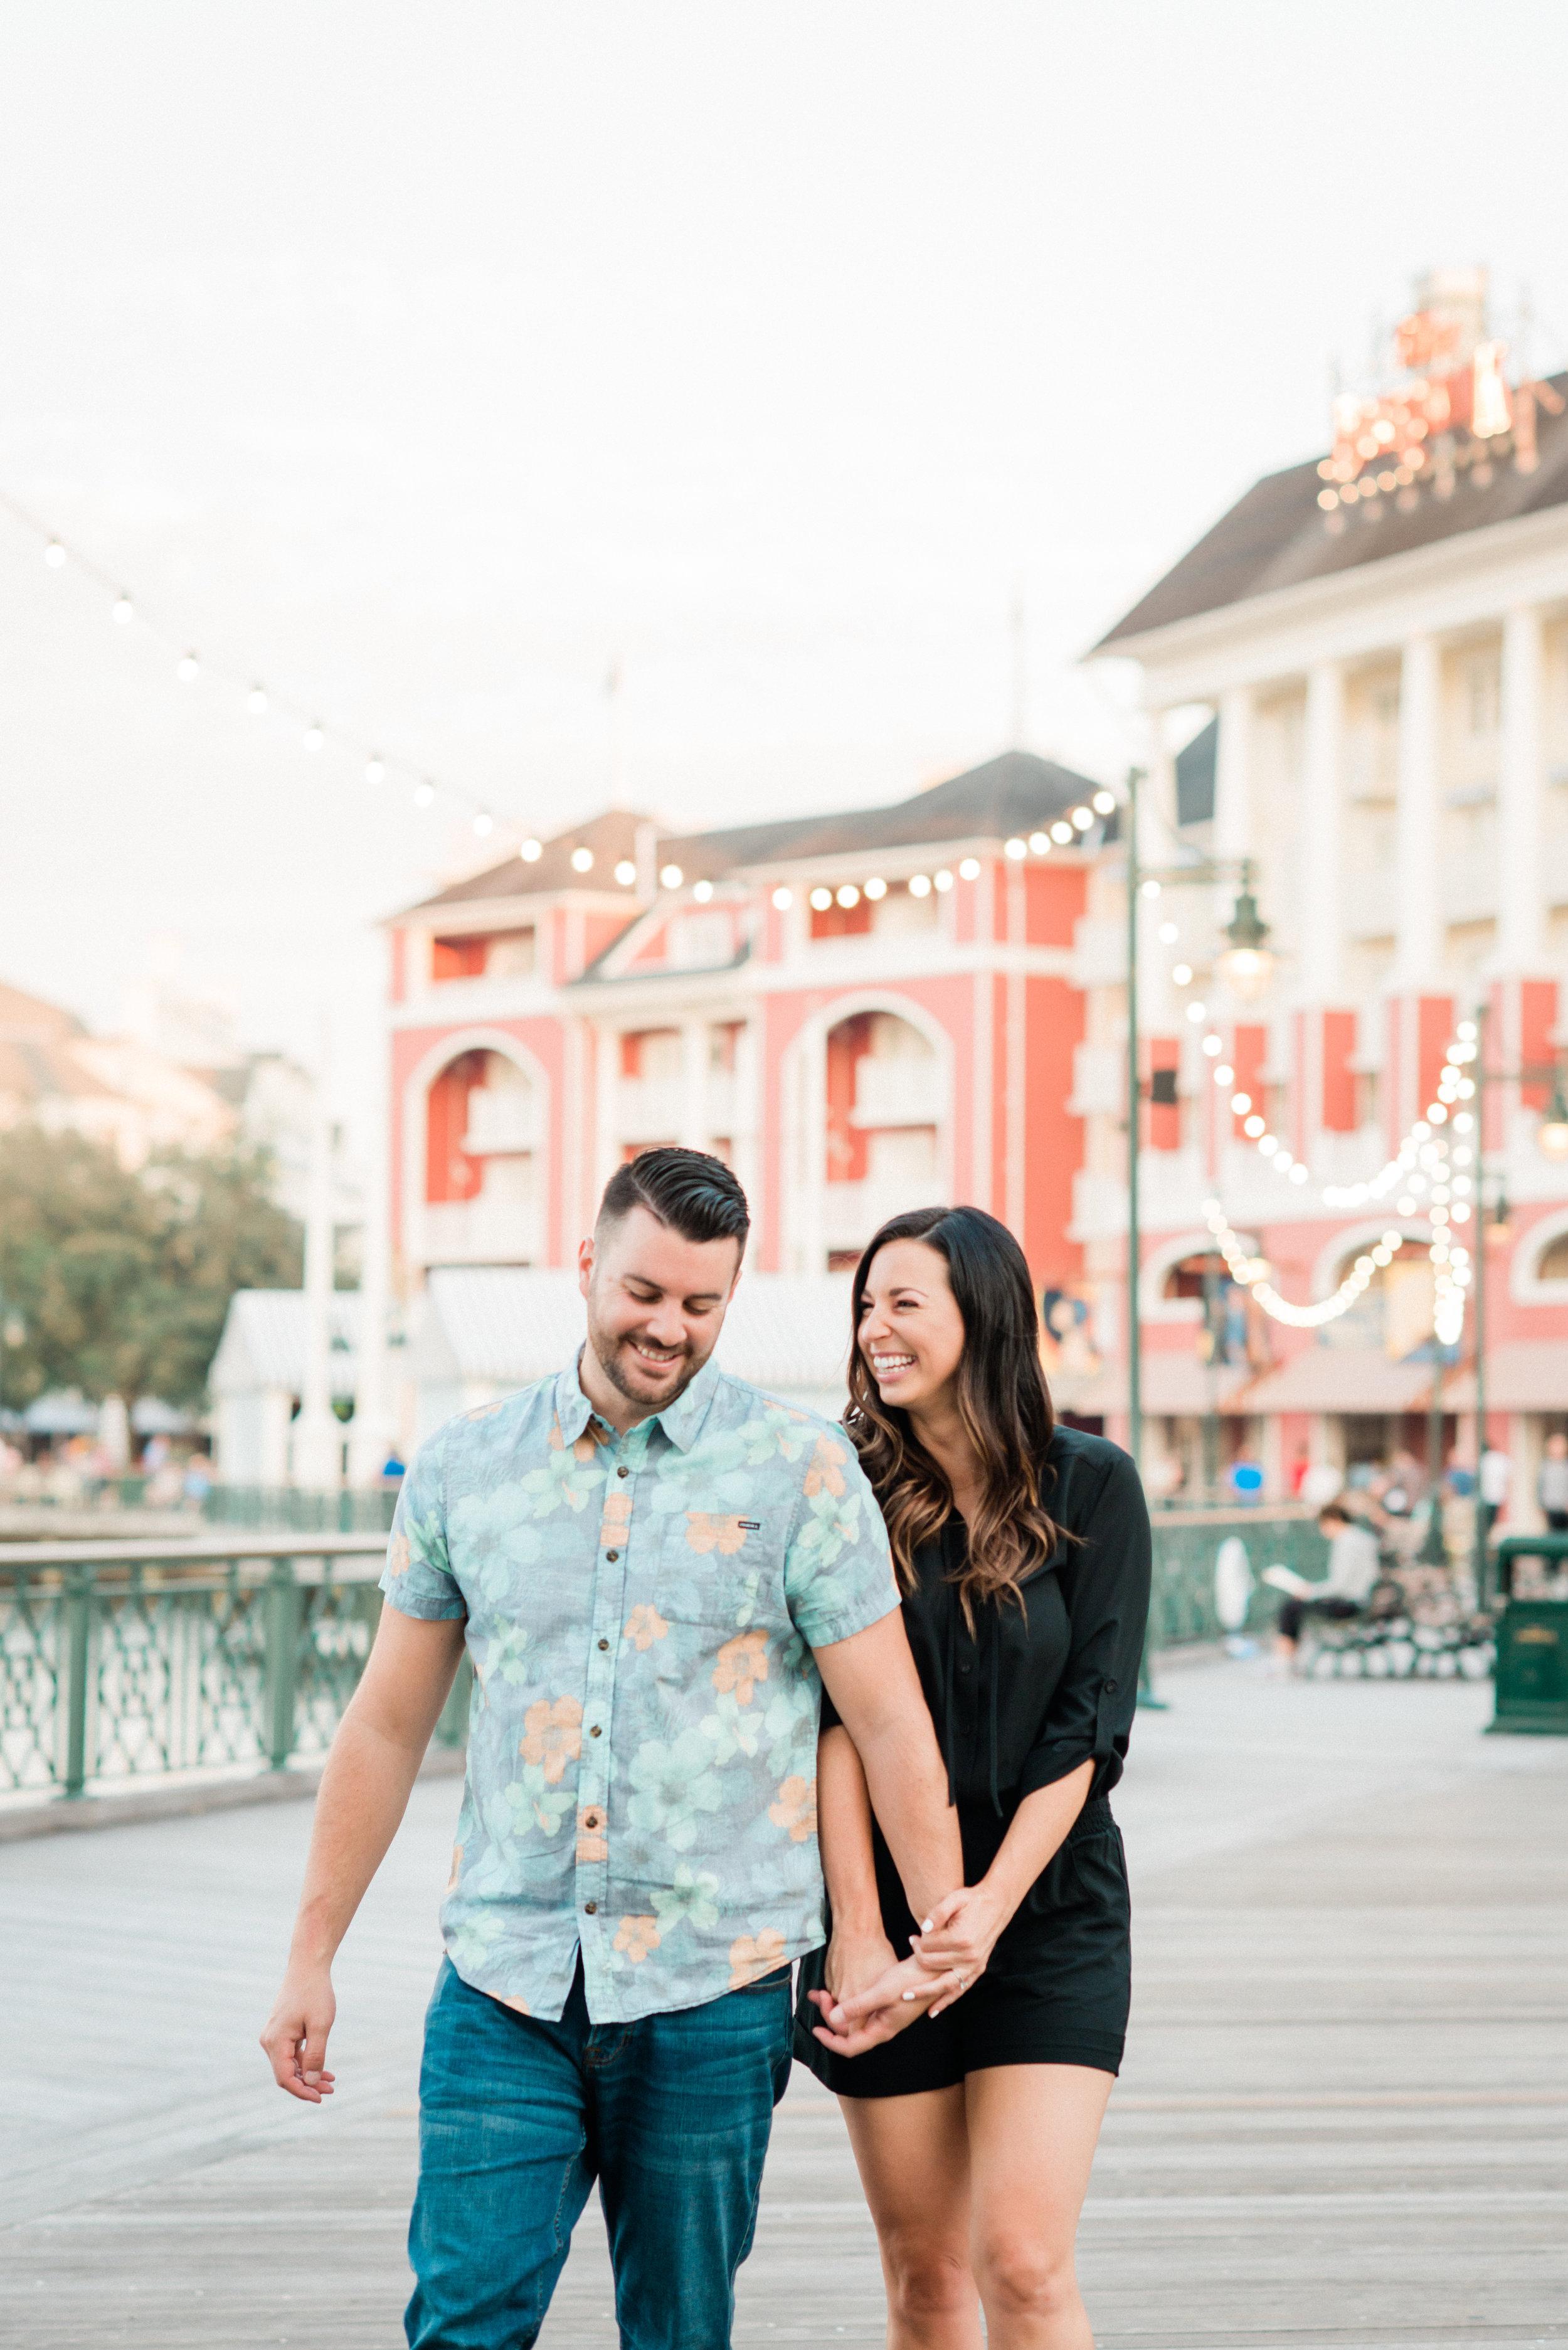 KateTaramykinStudios-Disney-Boardwalk-Couples-Portraits-KatMarc-30.jpg